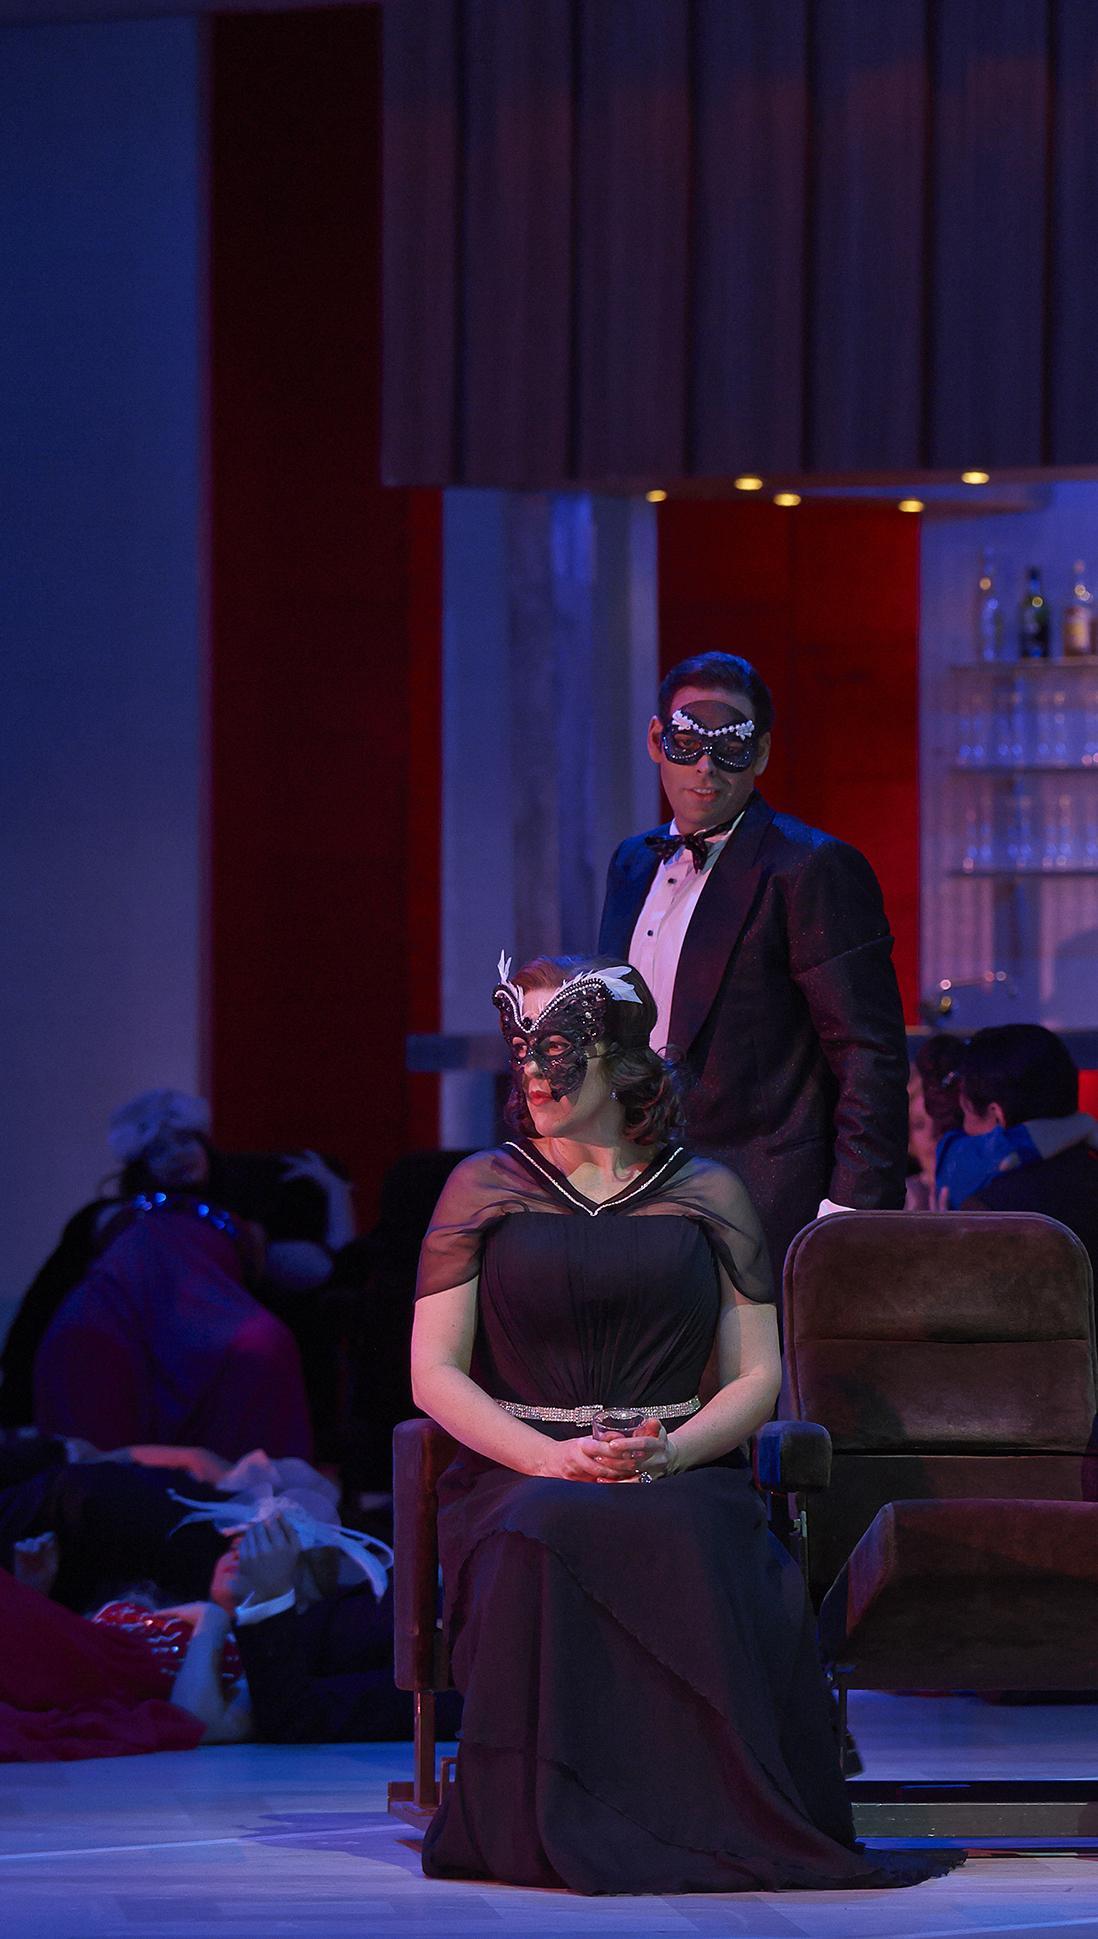 Adrianne Pieczonka & Dimitri Pittas, A Masked Ball